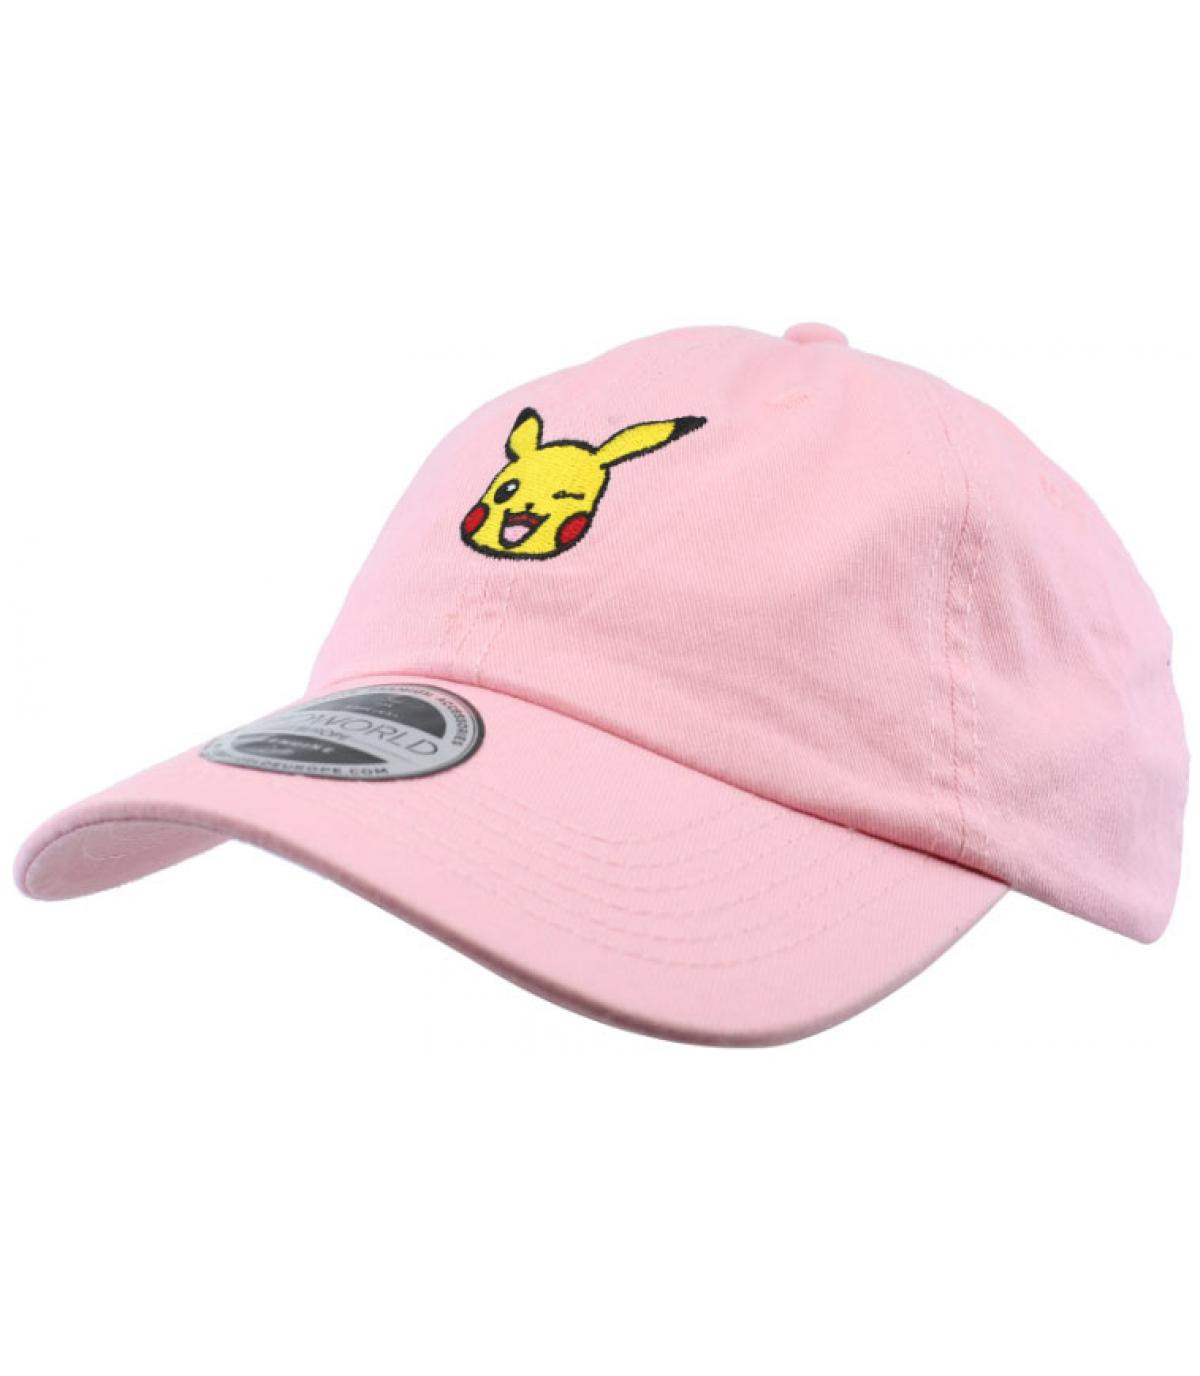 438797b62f3768 casquette Pikachu Pokemon rose - Pikachu Dad Hat pink par Bioworld ...